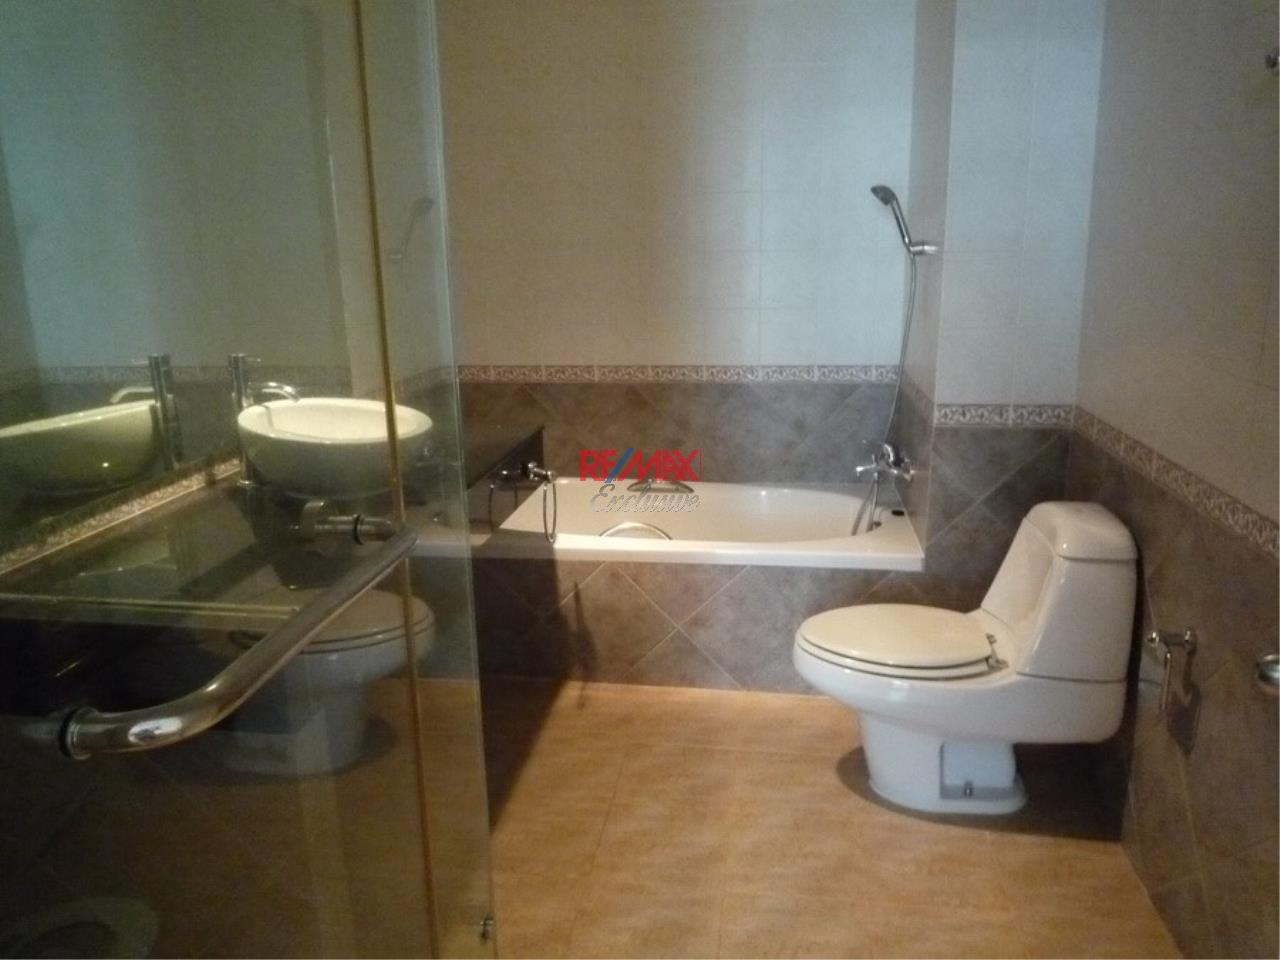 RE/MAX Exclusive Agency's Baan Klang Krung Thonglor 4 Bedrooms, 350 SQM., For Rent! 9